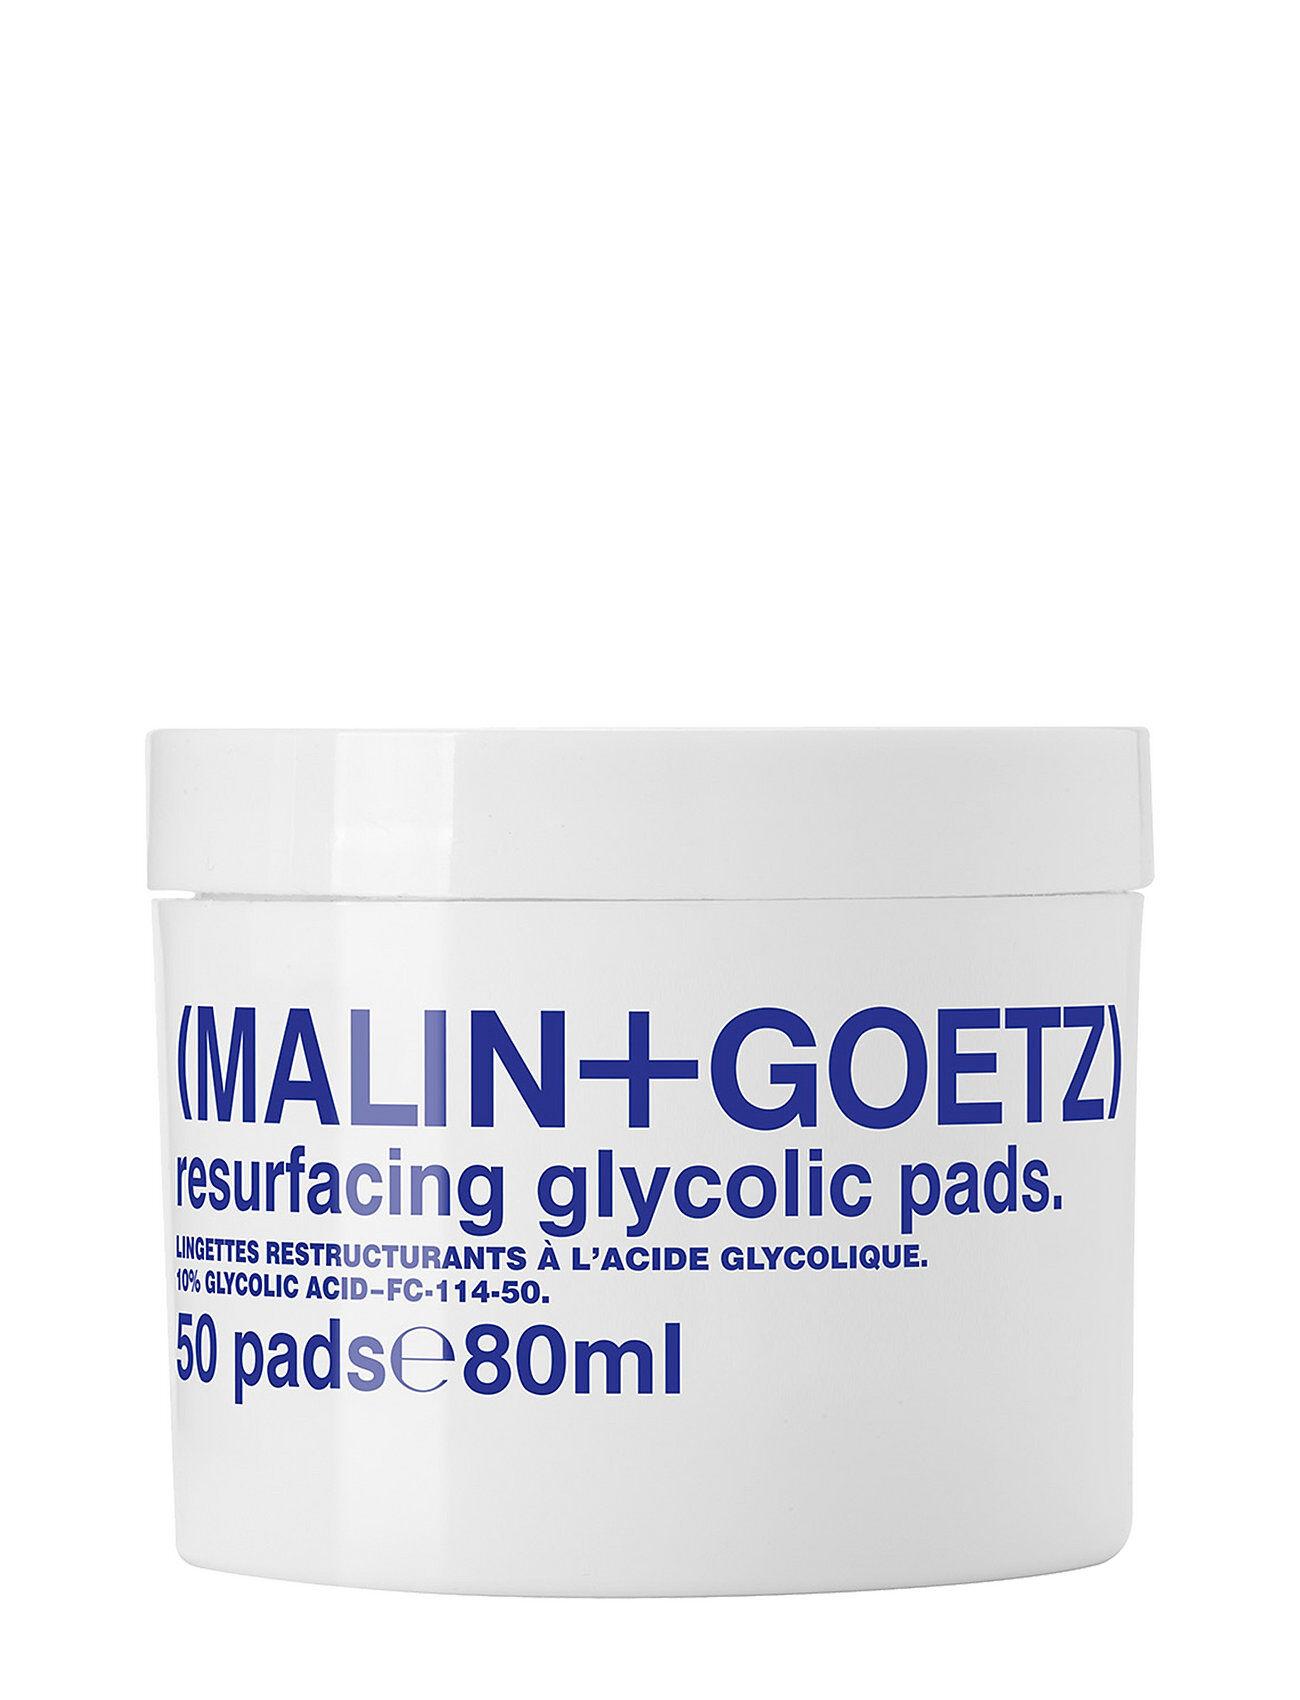 Malin+Goetz Resurfacing Glycolic Pads